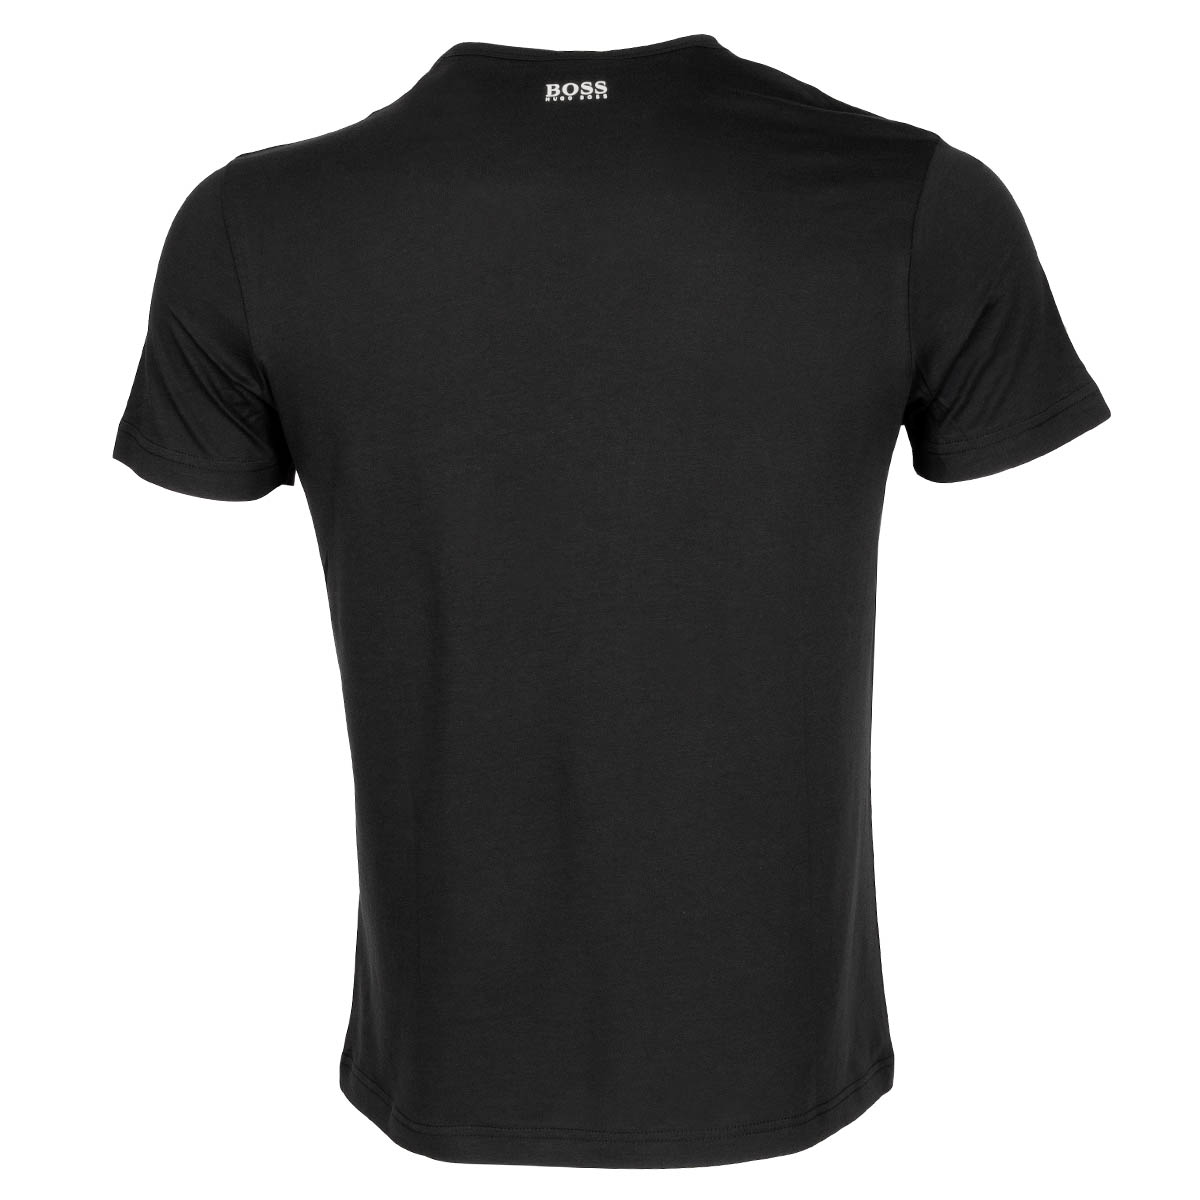 hugo boss tee 1 t shirt 2016 scottsdale golf. Black Bedroom Furniture Sets. Home Design Ideas